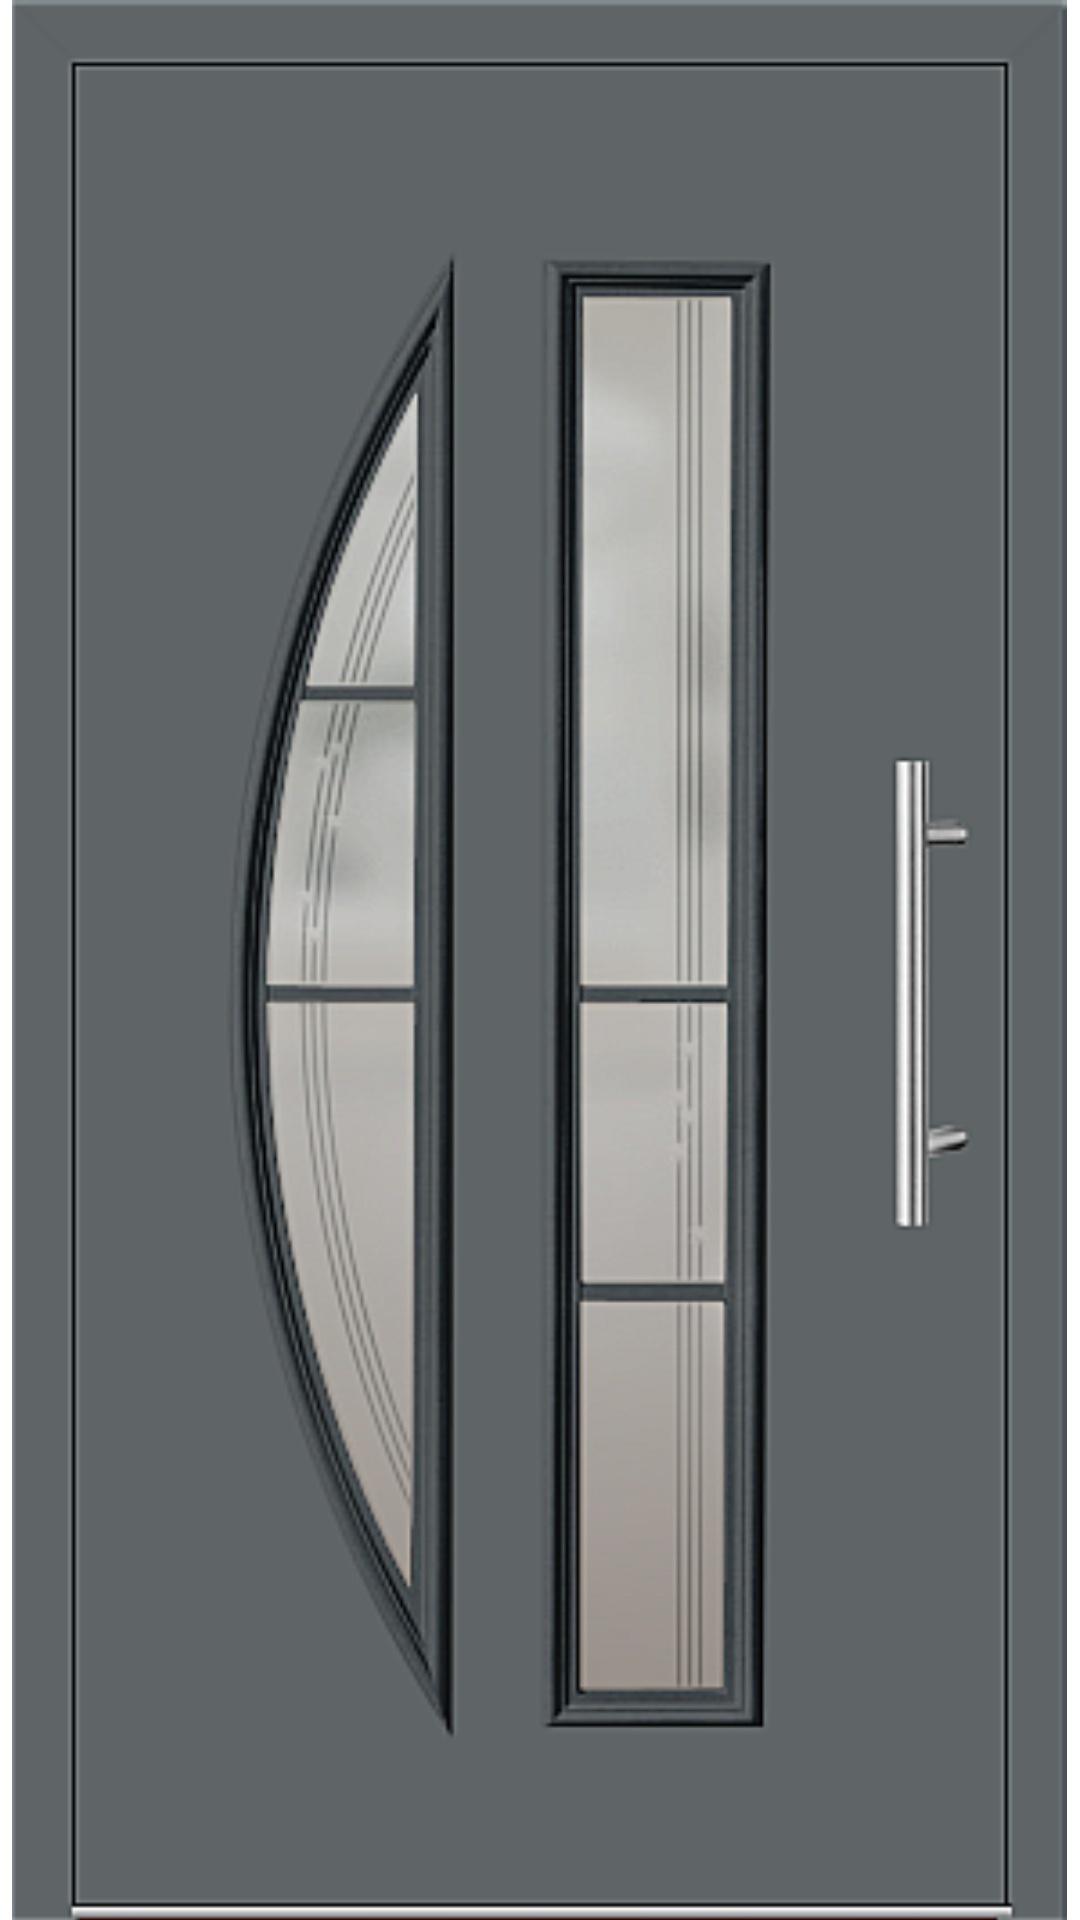 Kunststoff Haustür Modell 6525-65 basaltgrau